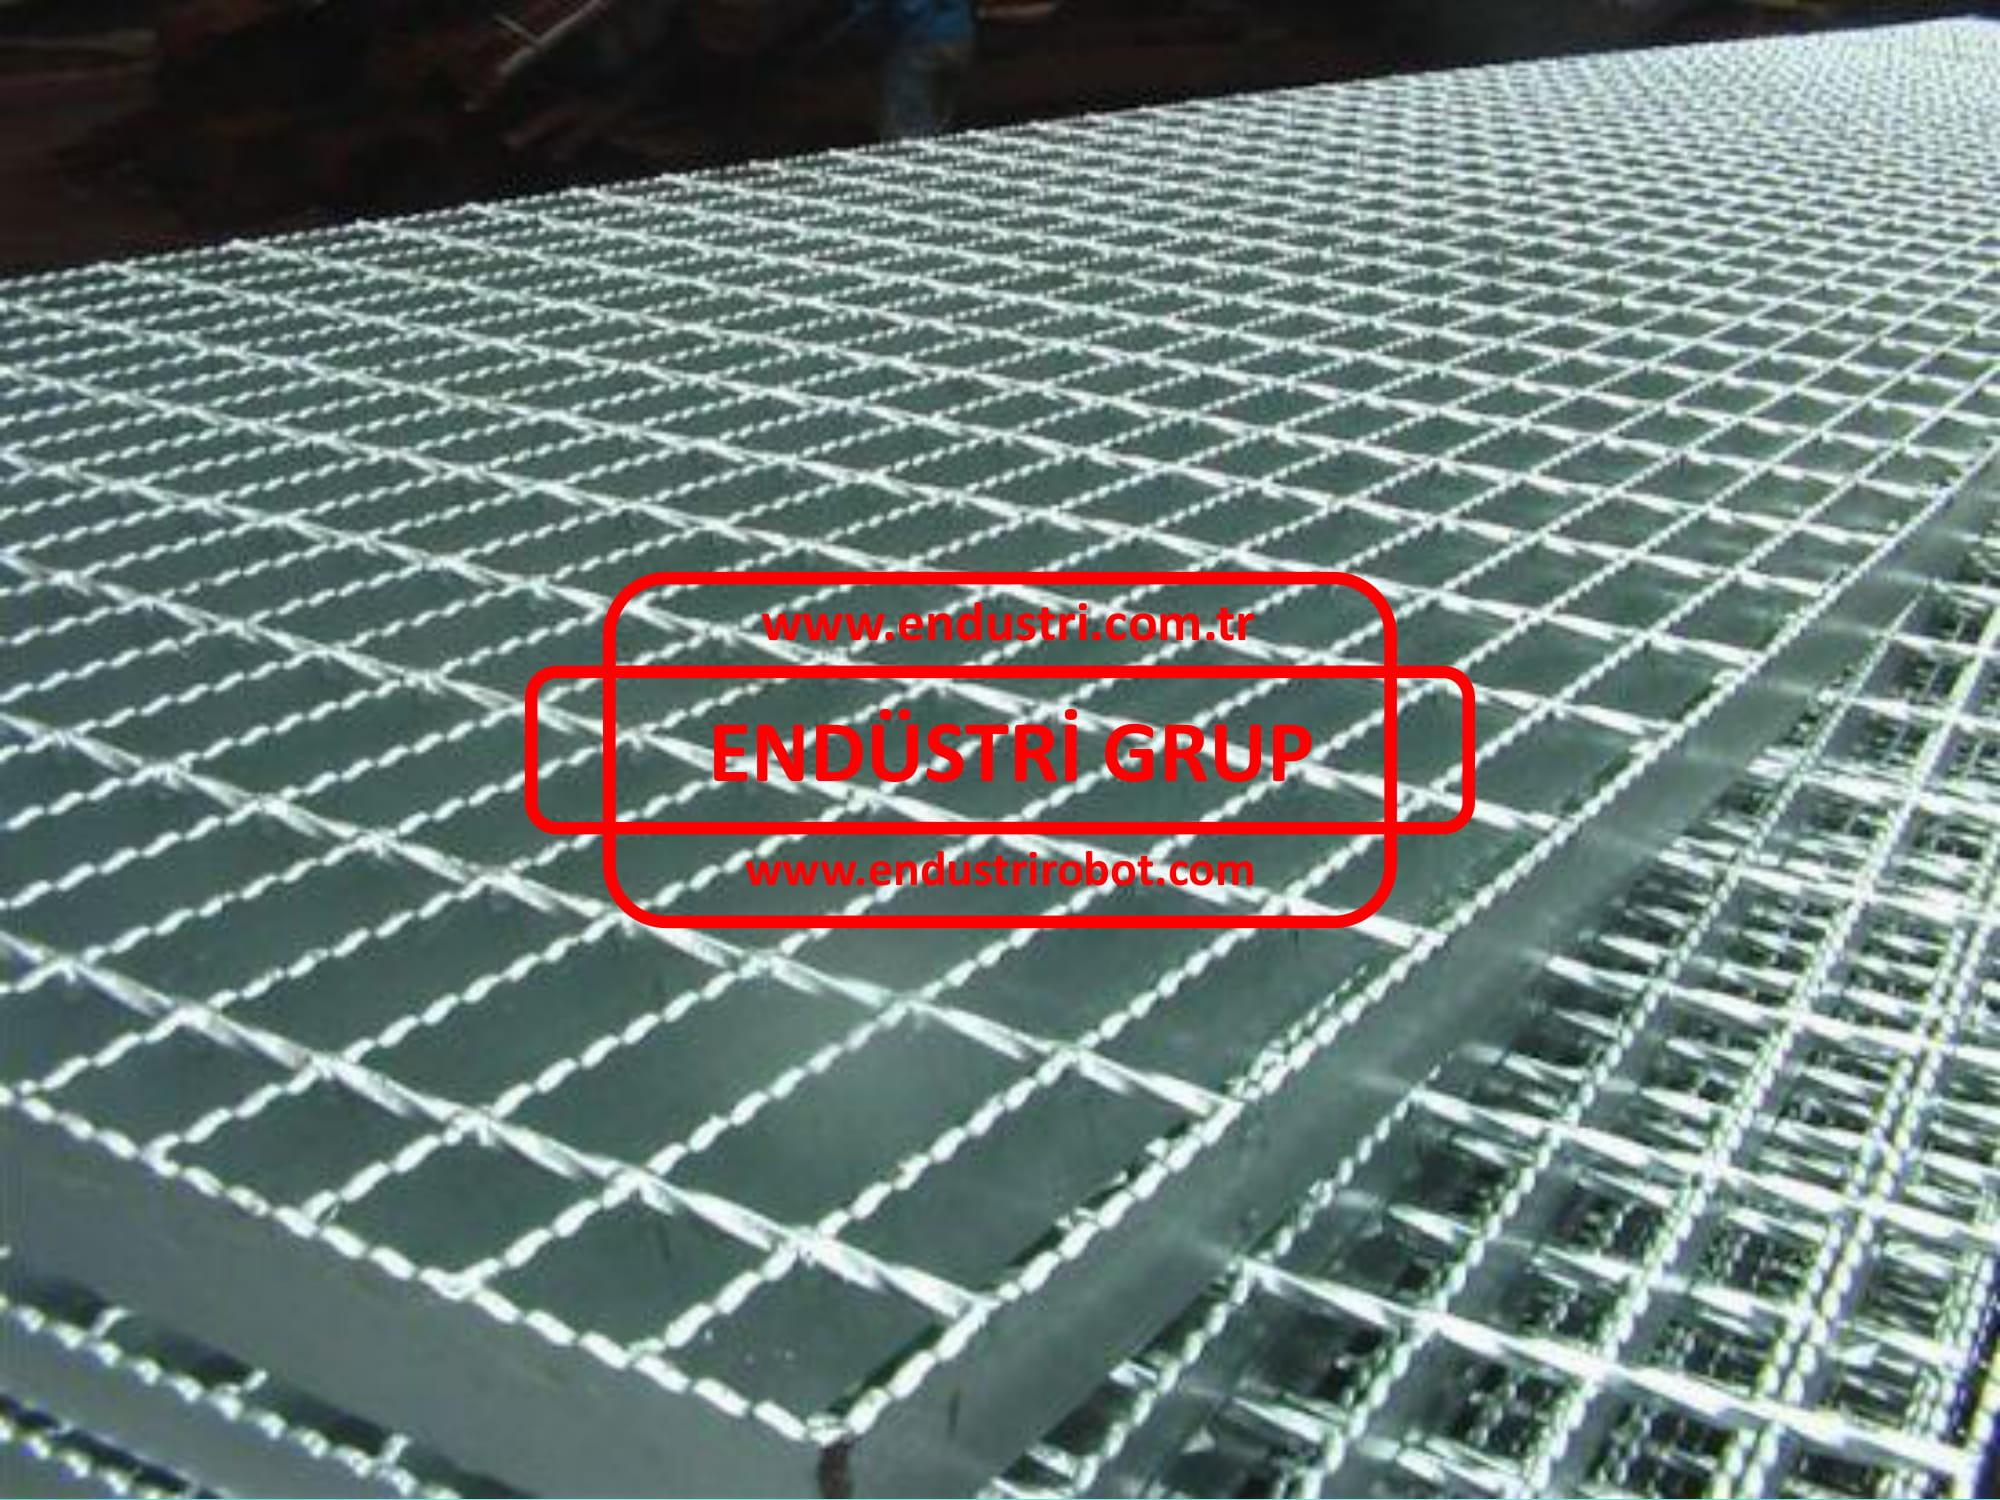 galvanizli-platform-izgaralari-paslanmaz-petek-izgarasi-basamak-metal-celik-izgara